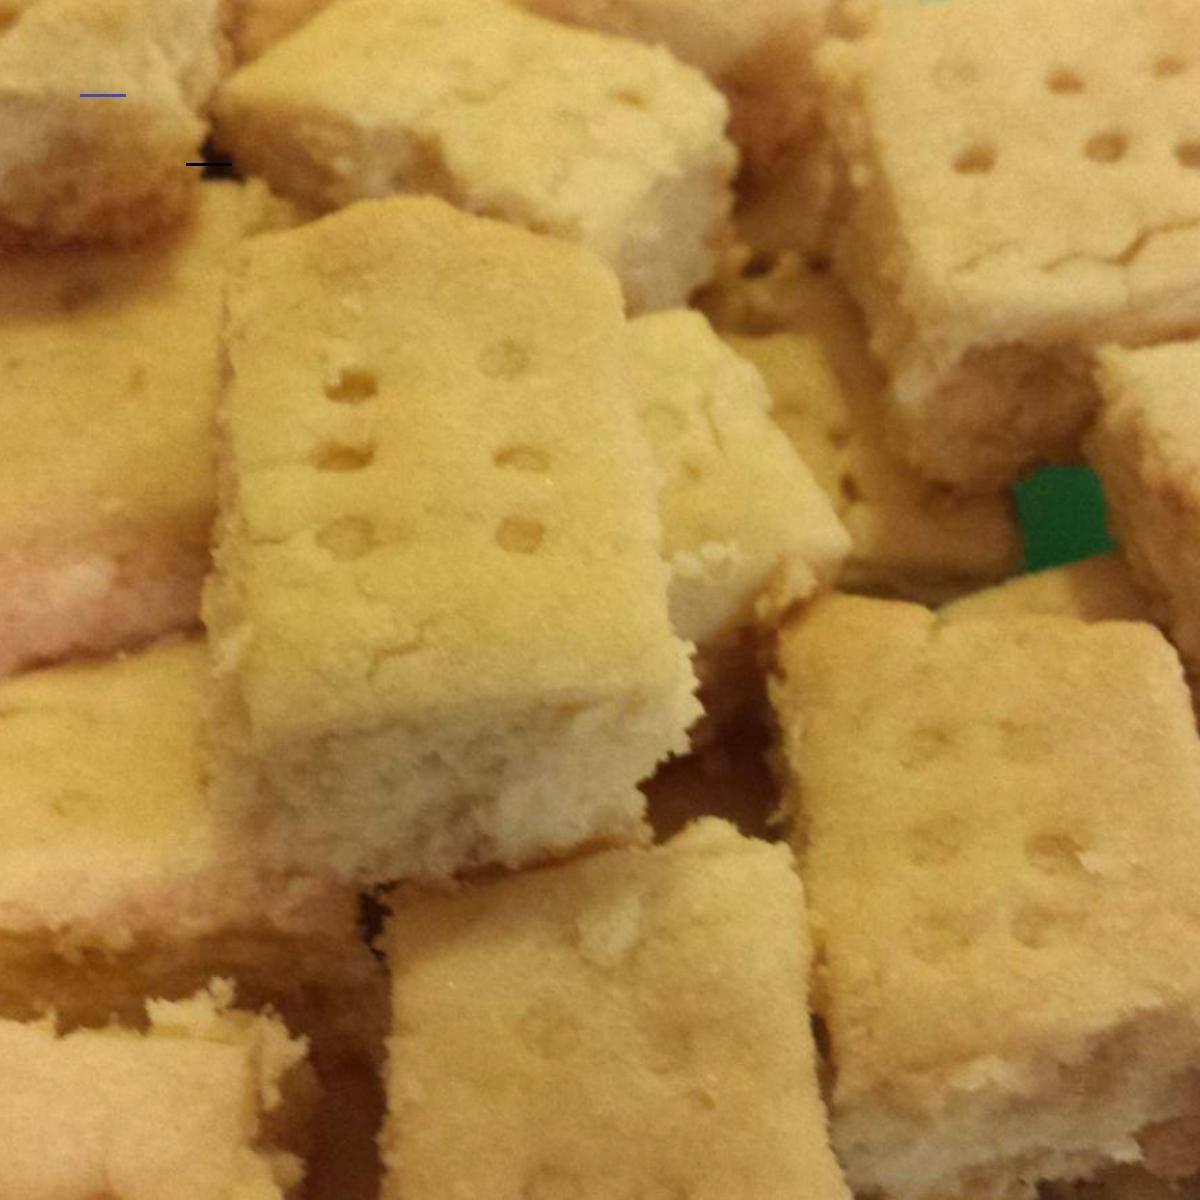 4e8379de51cc85ba5ecbdcbd0efca37f - Better Homes And Gardens Shortbread Cookies